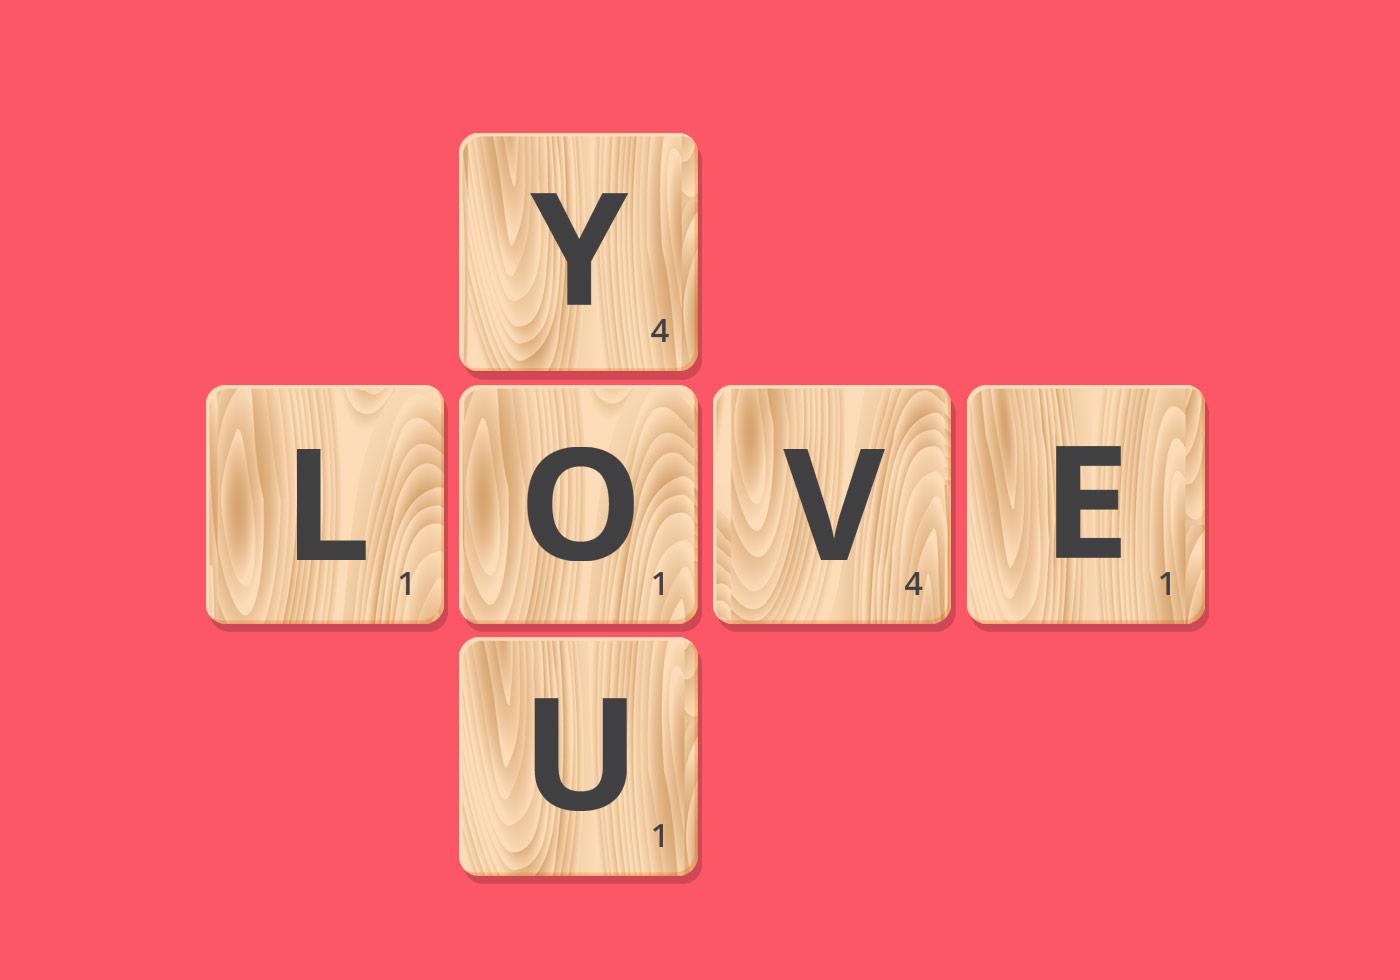 I Love You Imágenes De Stock I Love You Fotos De Stock: Love You Scrabble Block Vector